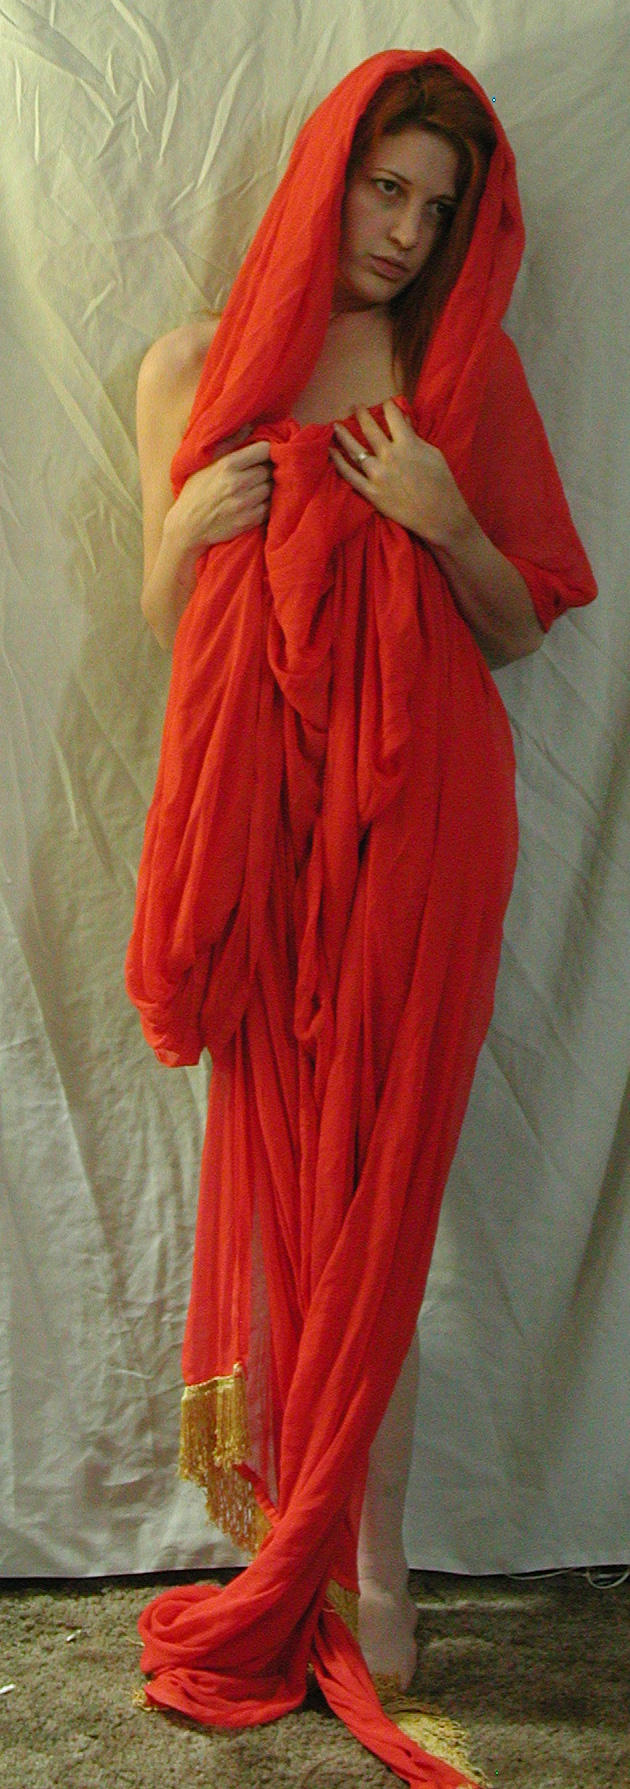 Orange 9 by lockstock